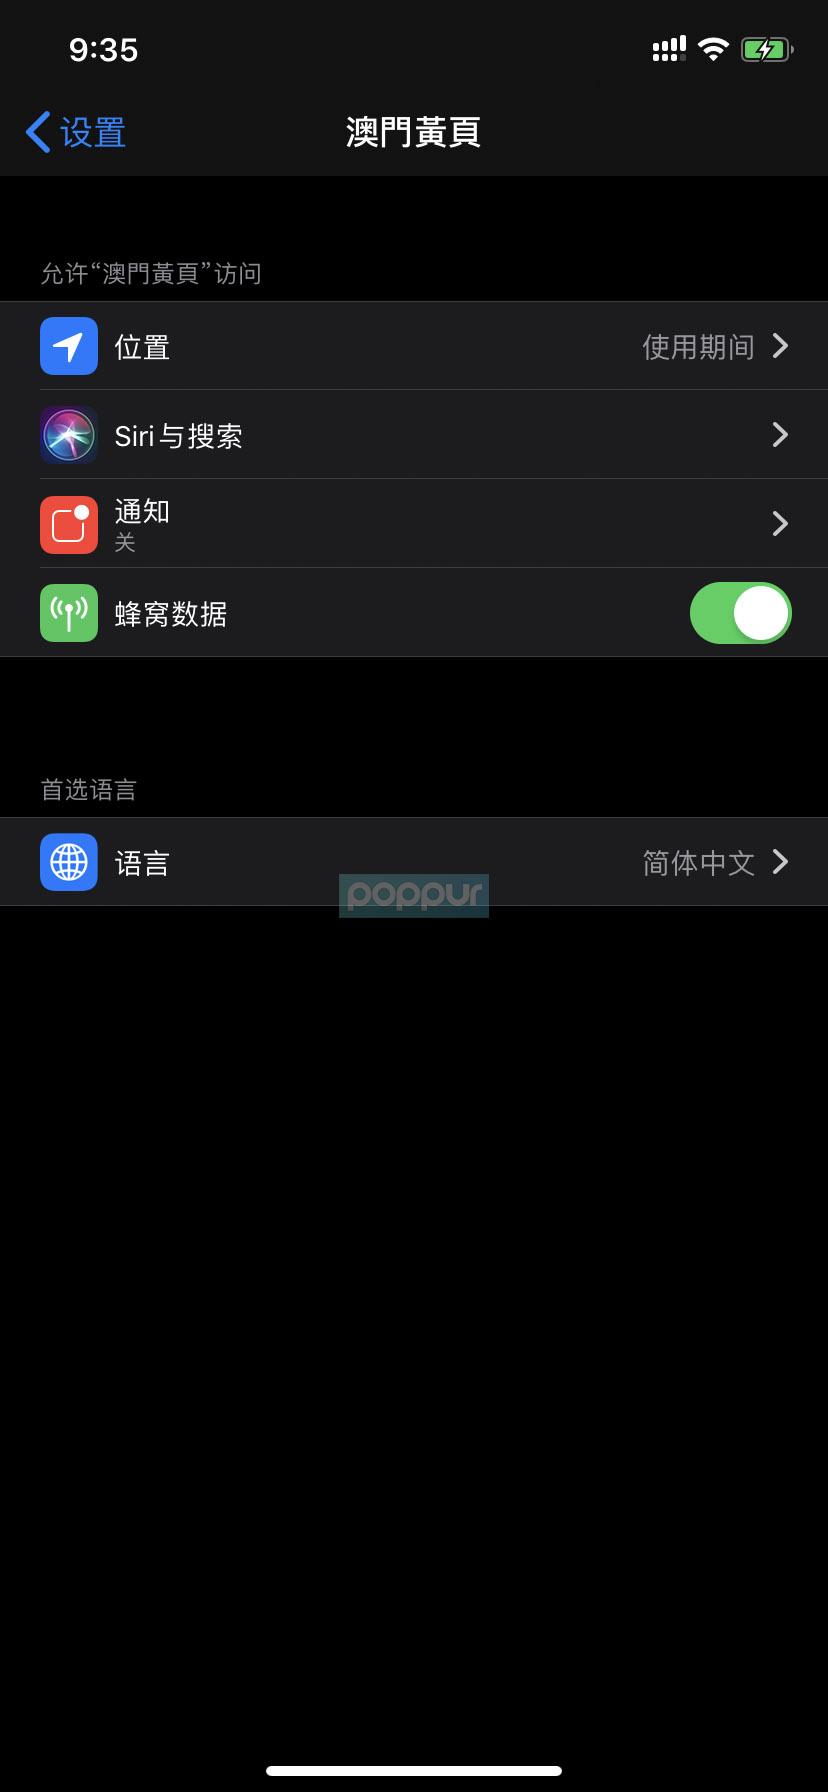 iphone字体风格怎么改(苹果怎么换个性字体)